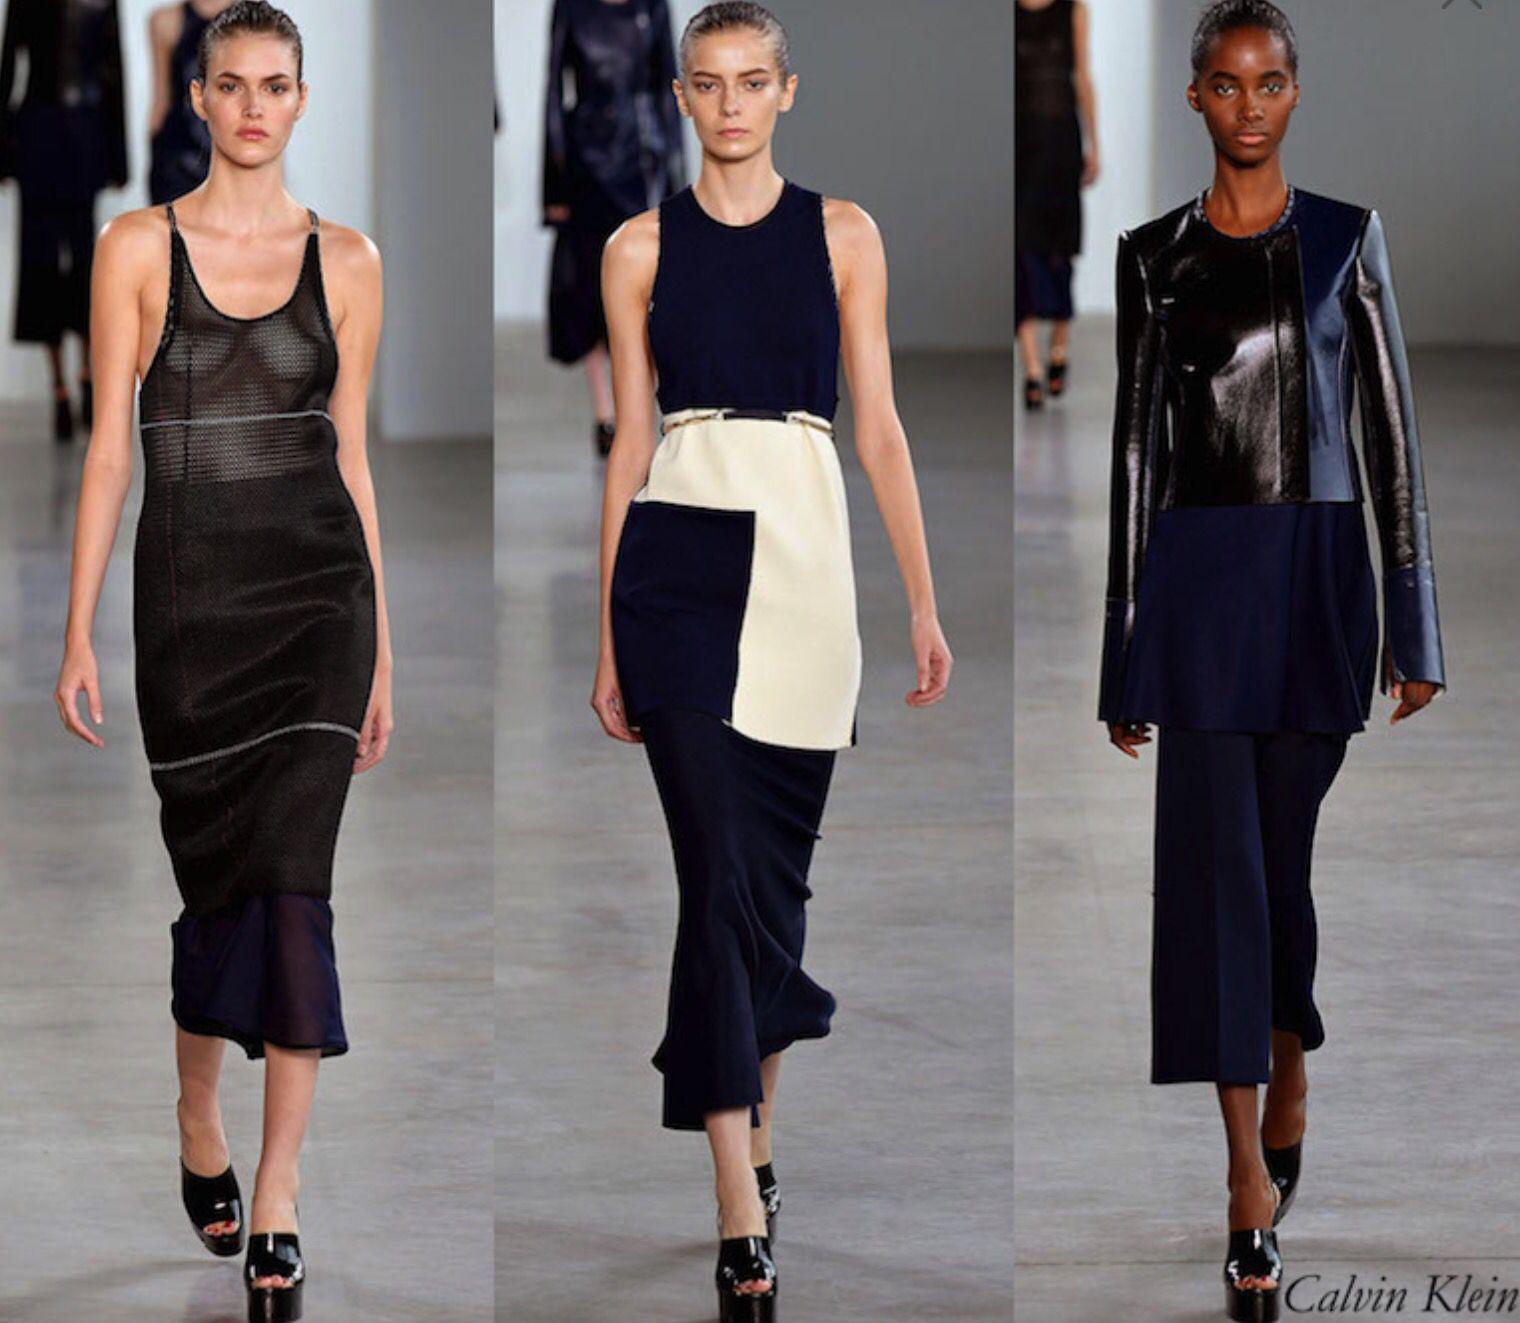 Minimalism.Calvin Klein.   minimalism.   Pinterest a3a0a188f6